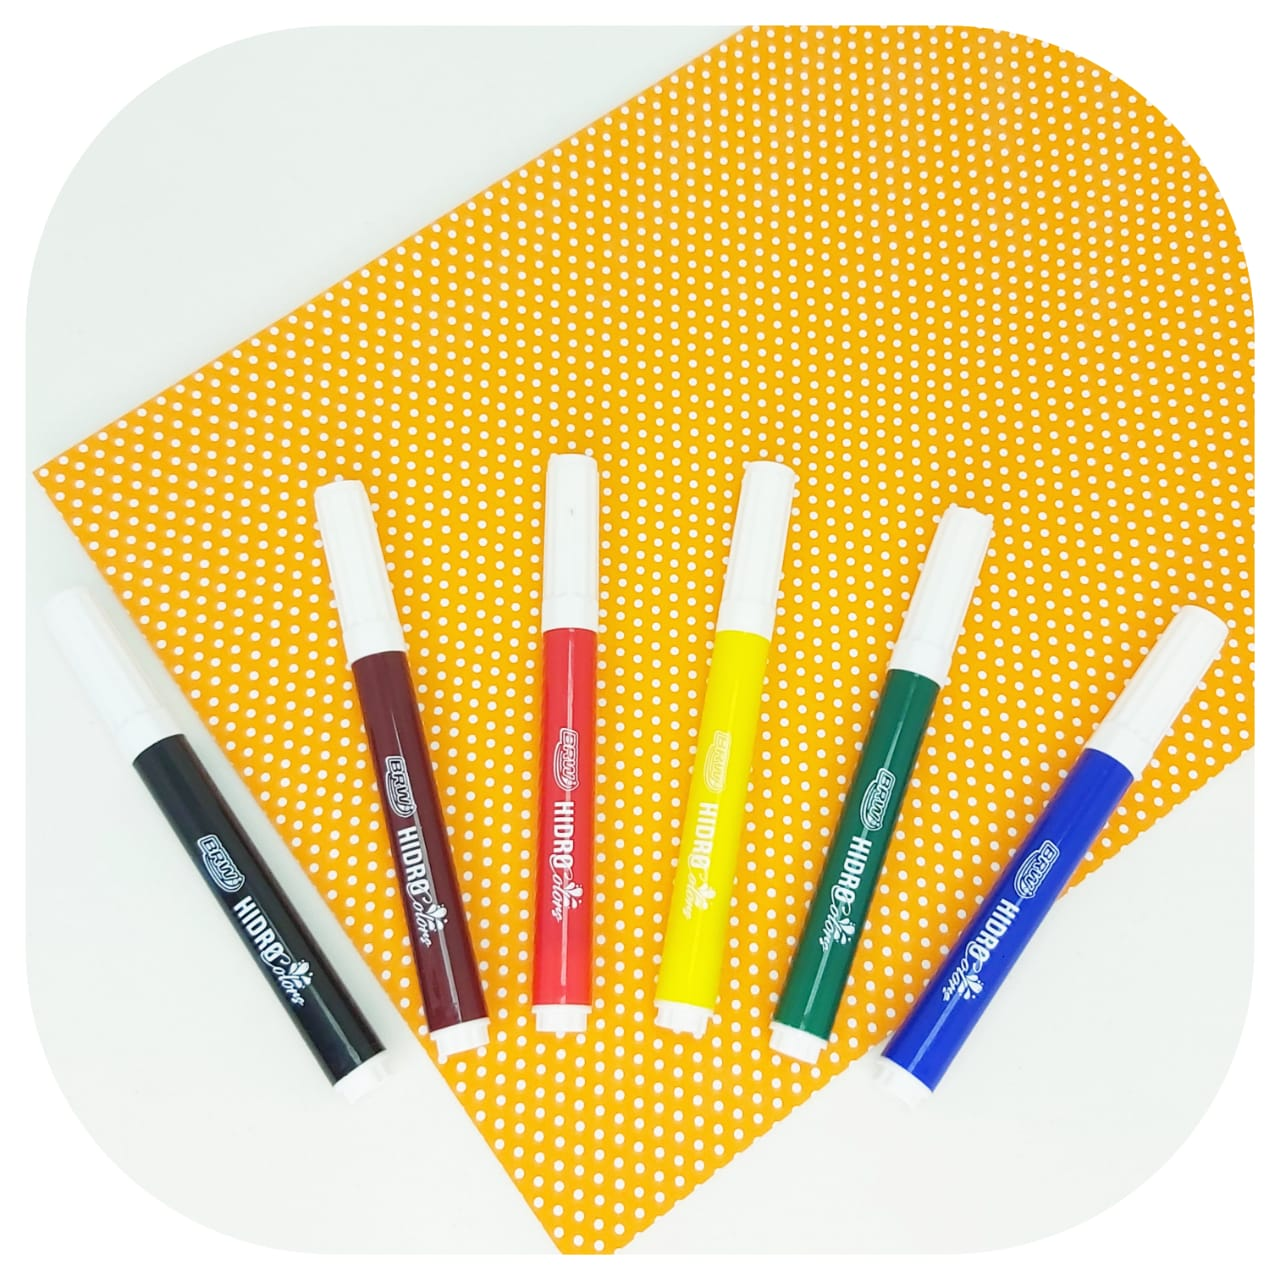 Kit 6 Canetinhas Hidro Color - BRW